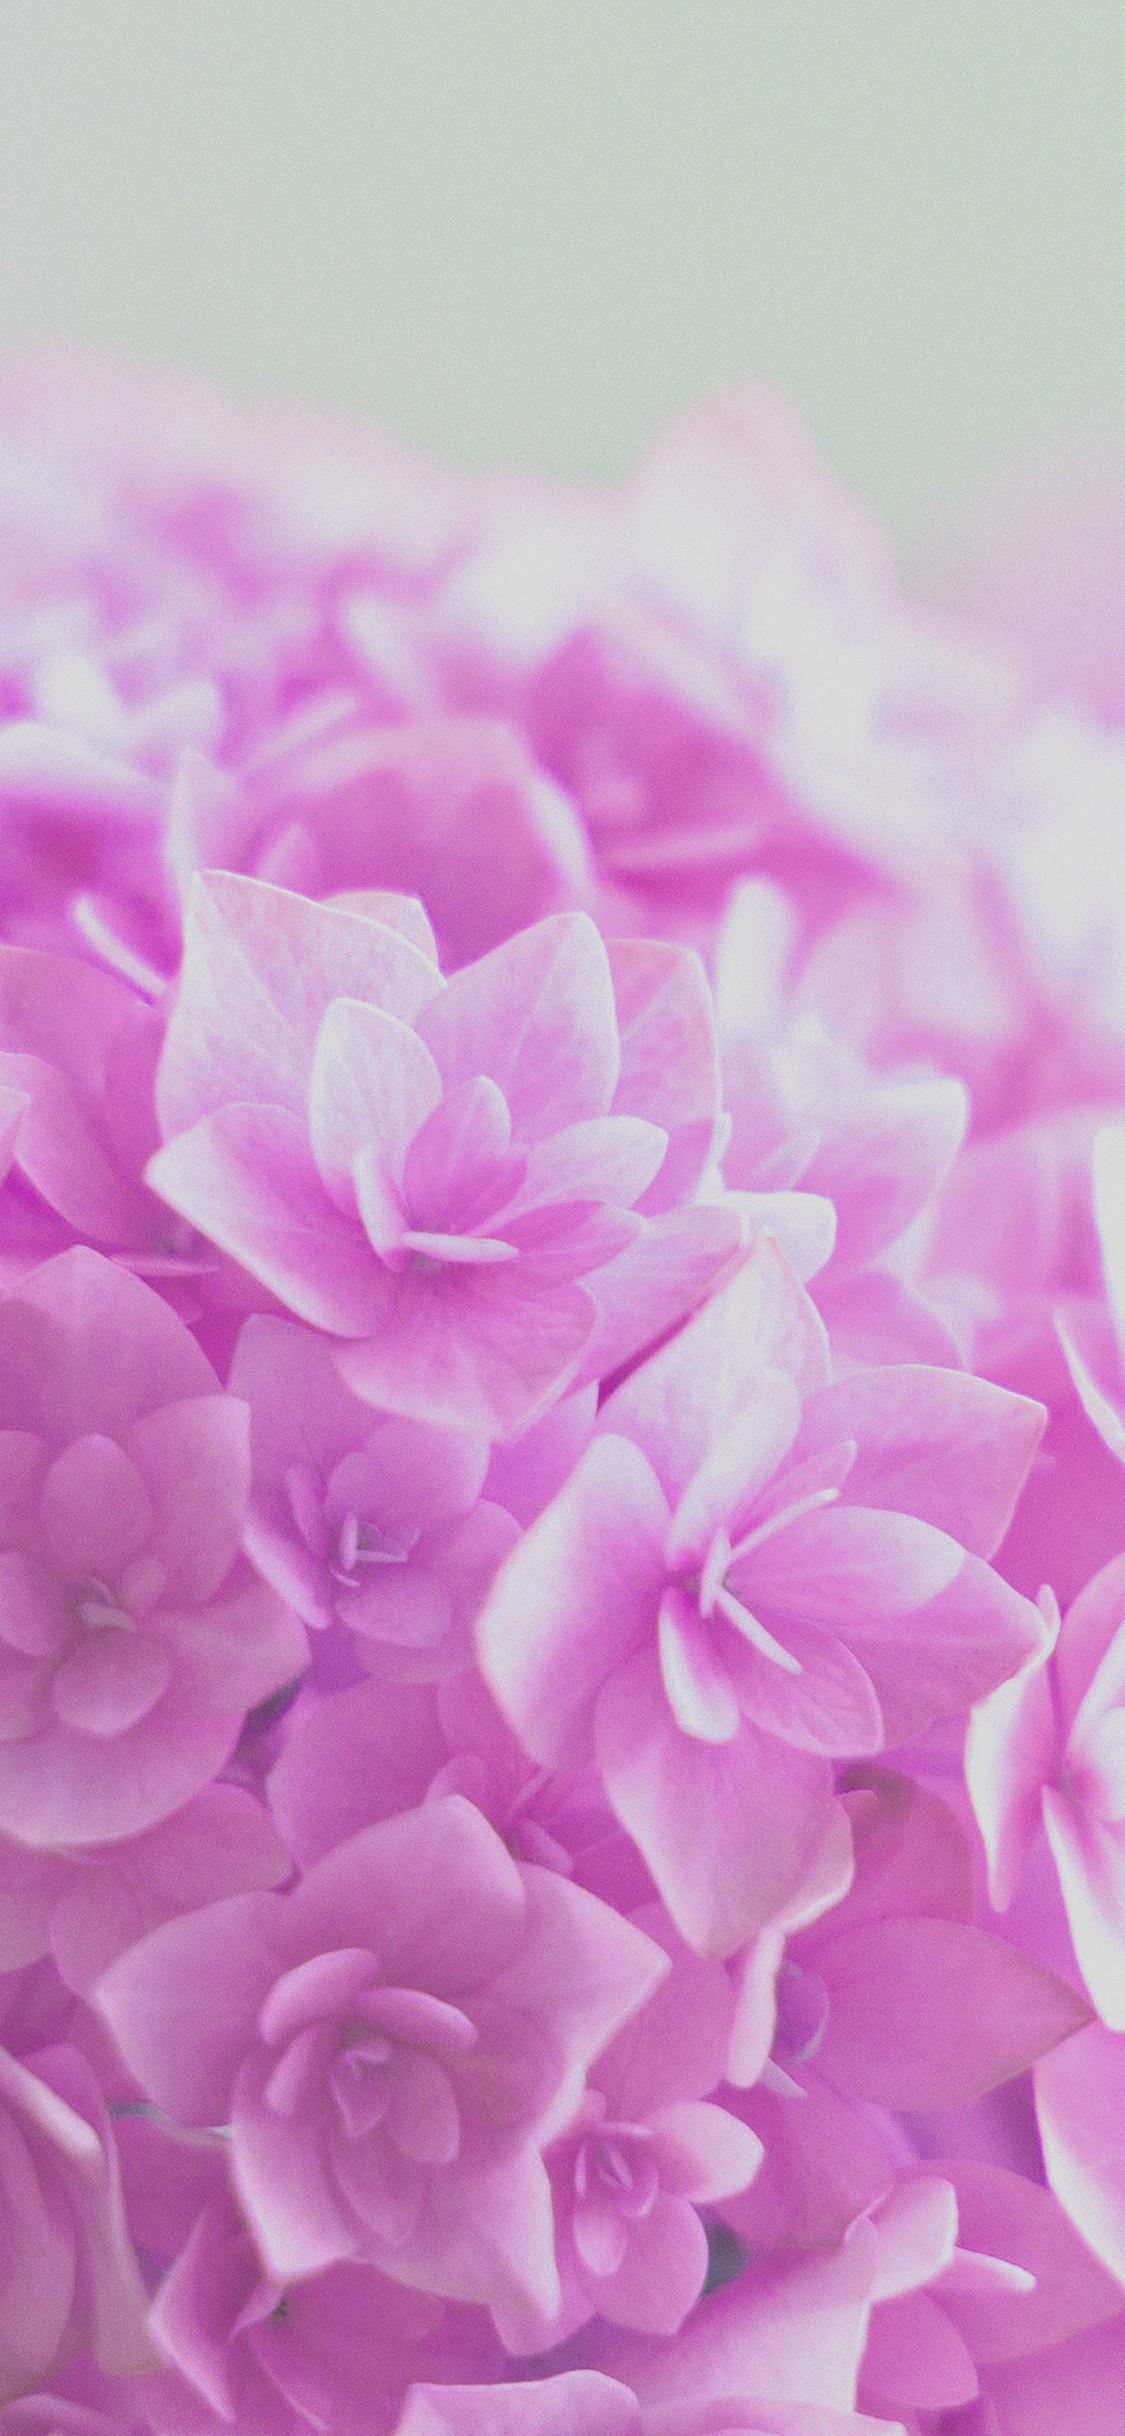 iPhoneXpapers.com-Apple-iPhone-wallpaper-mg39-red-hortensia-flower-beautiful-nature